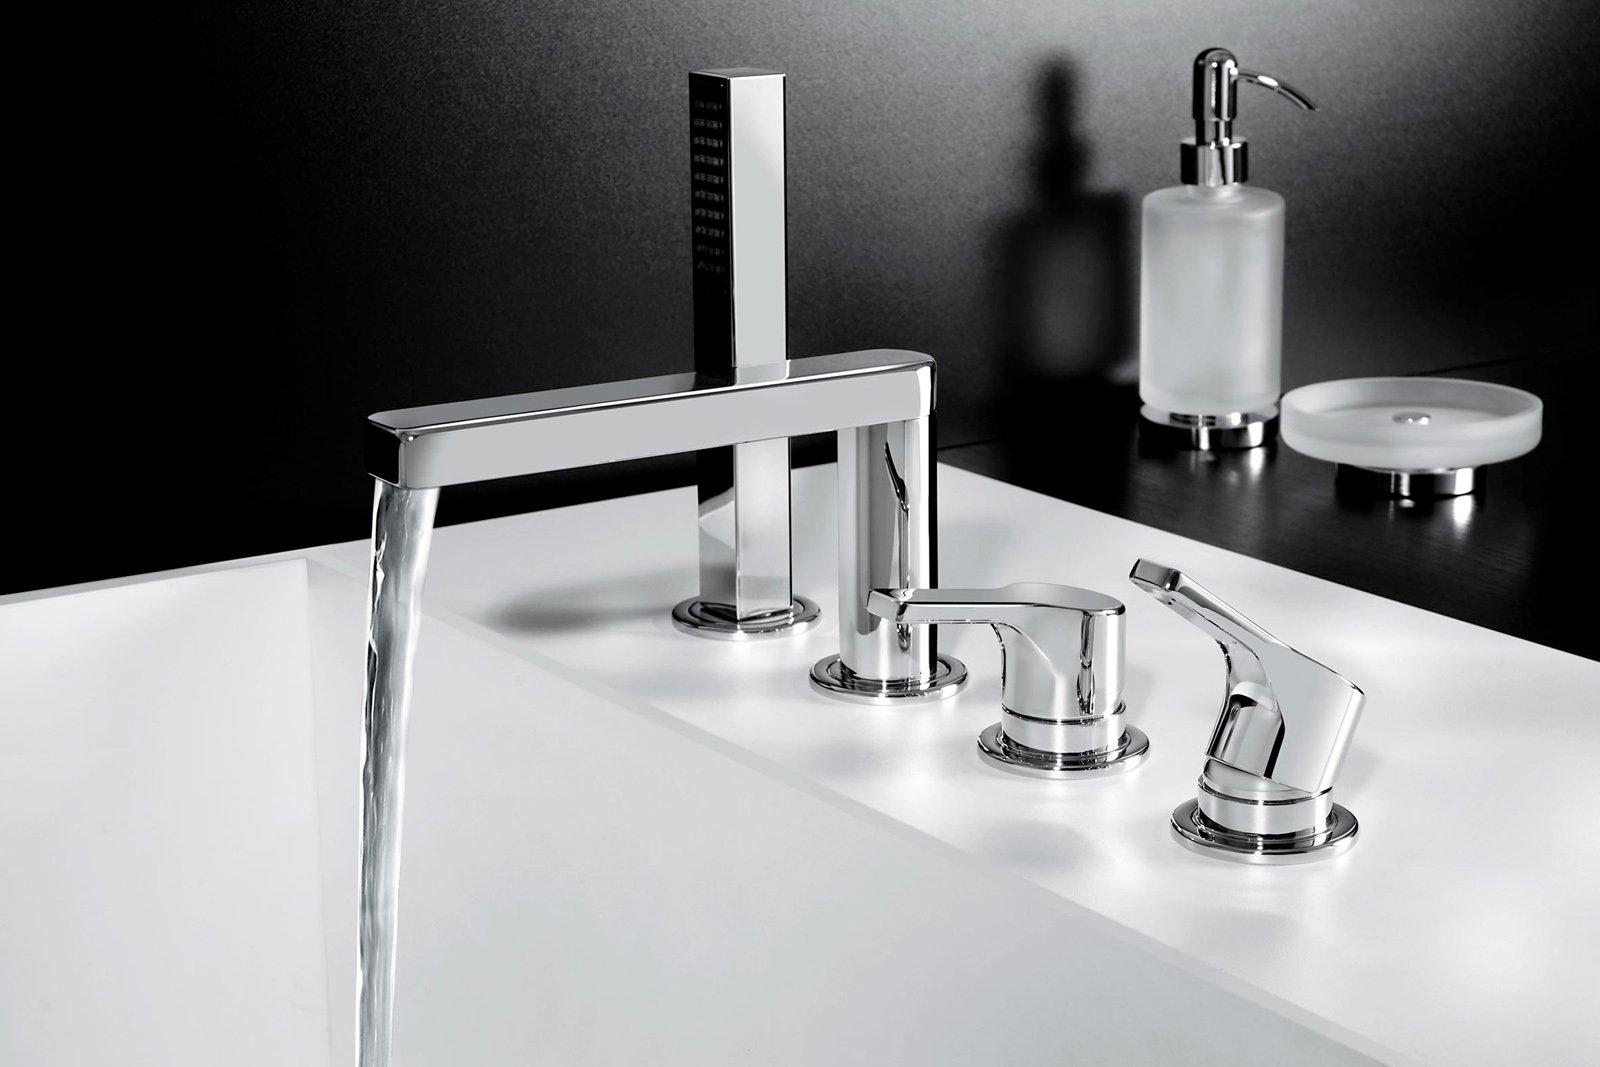 Acqua come diminuire i consumi cose di casa - Cucina induzione consumi ...